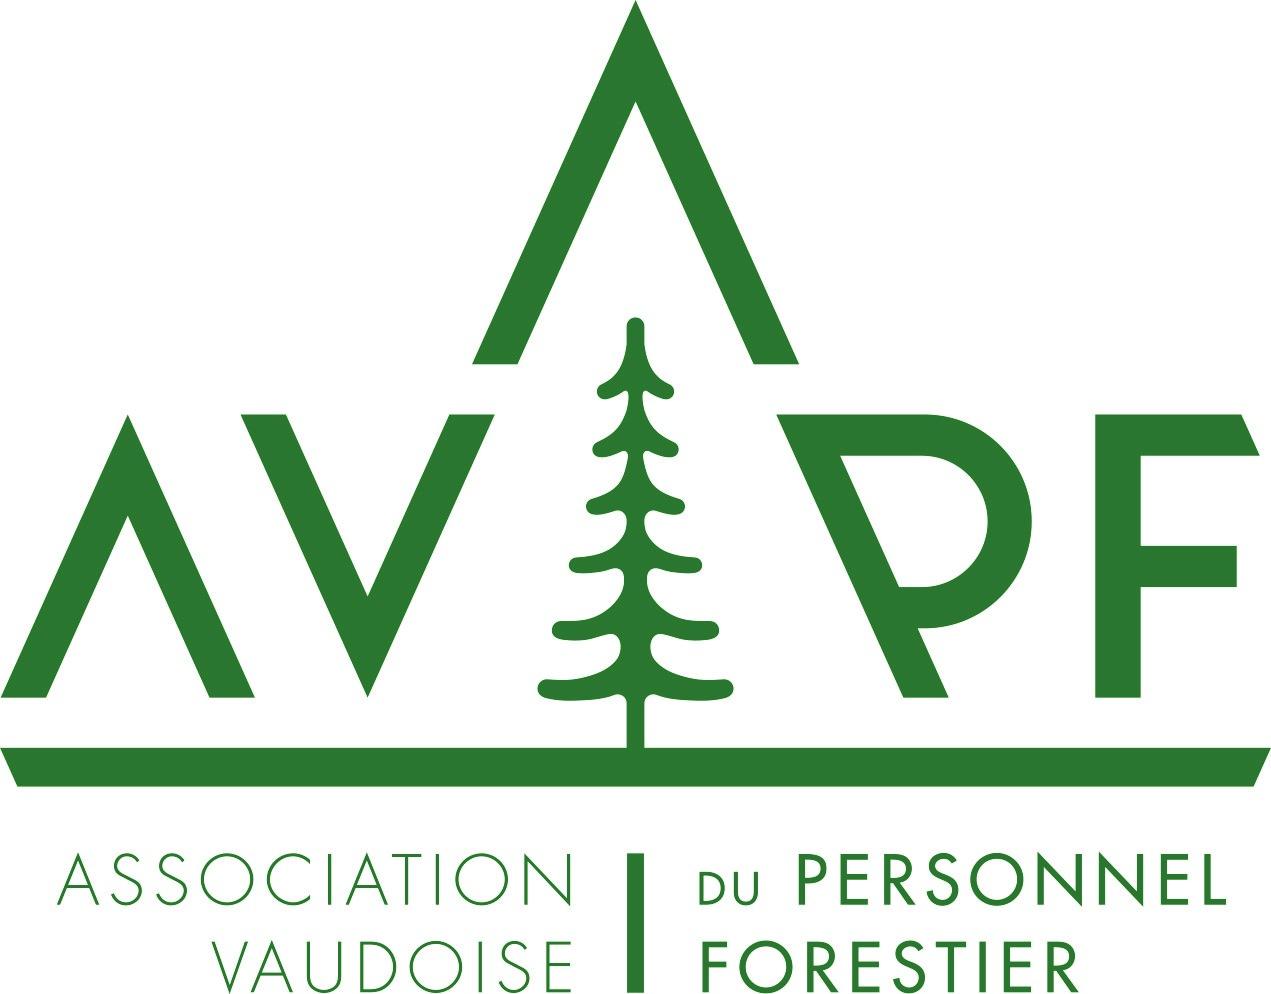 AVPF à notre sujet